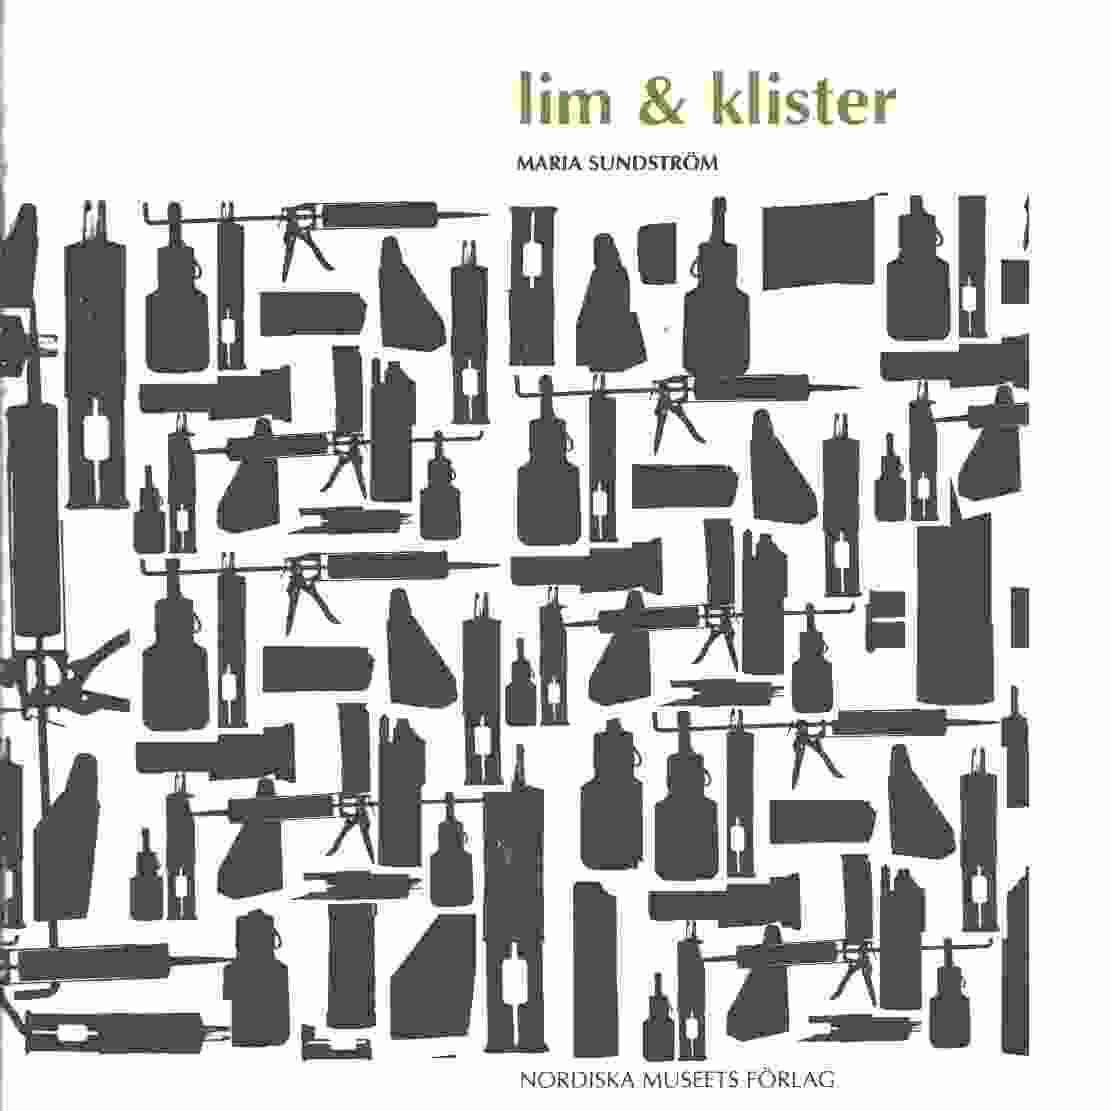 Lim & klister - Sundström, Maria